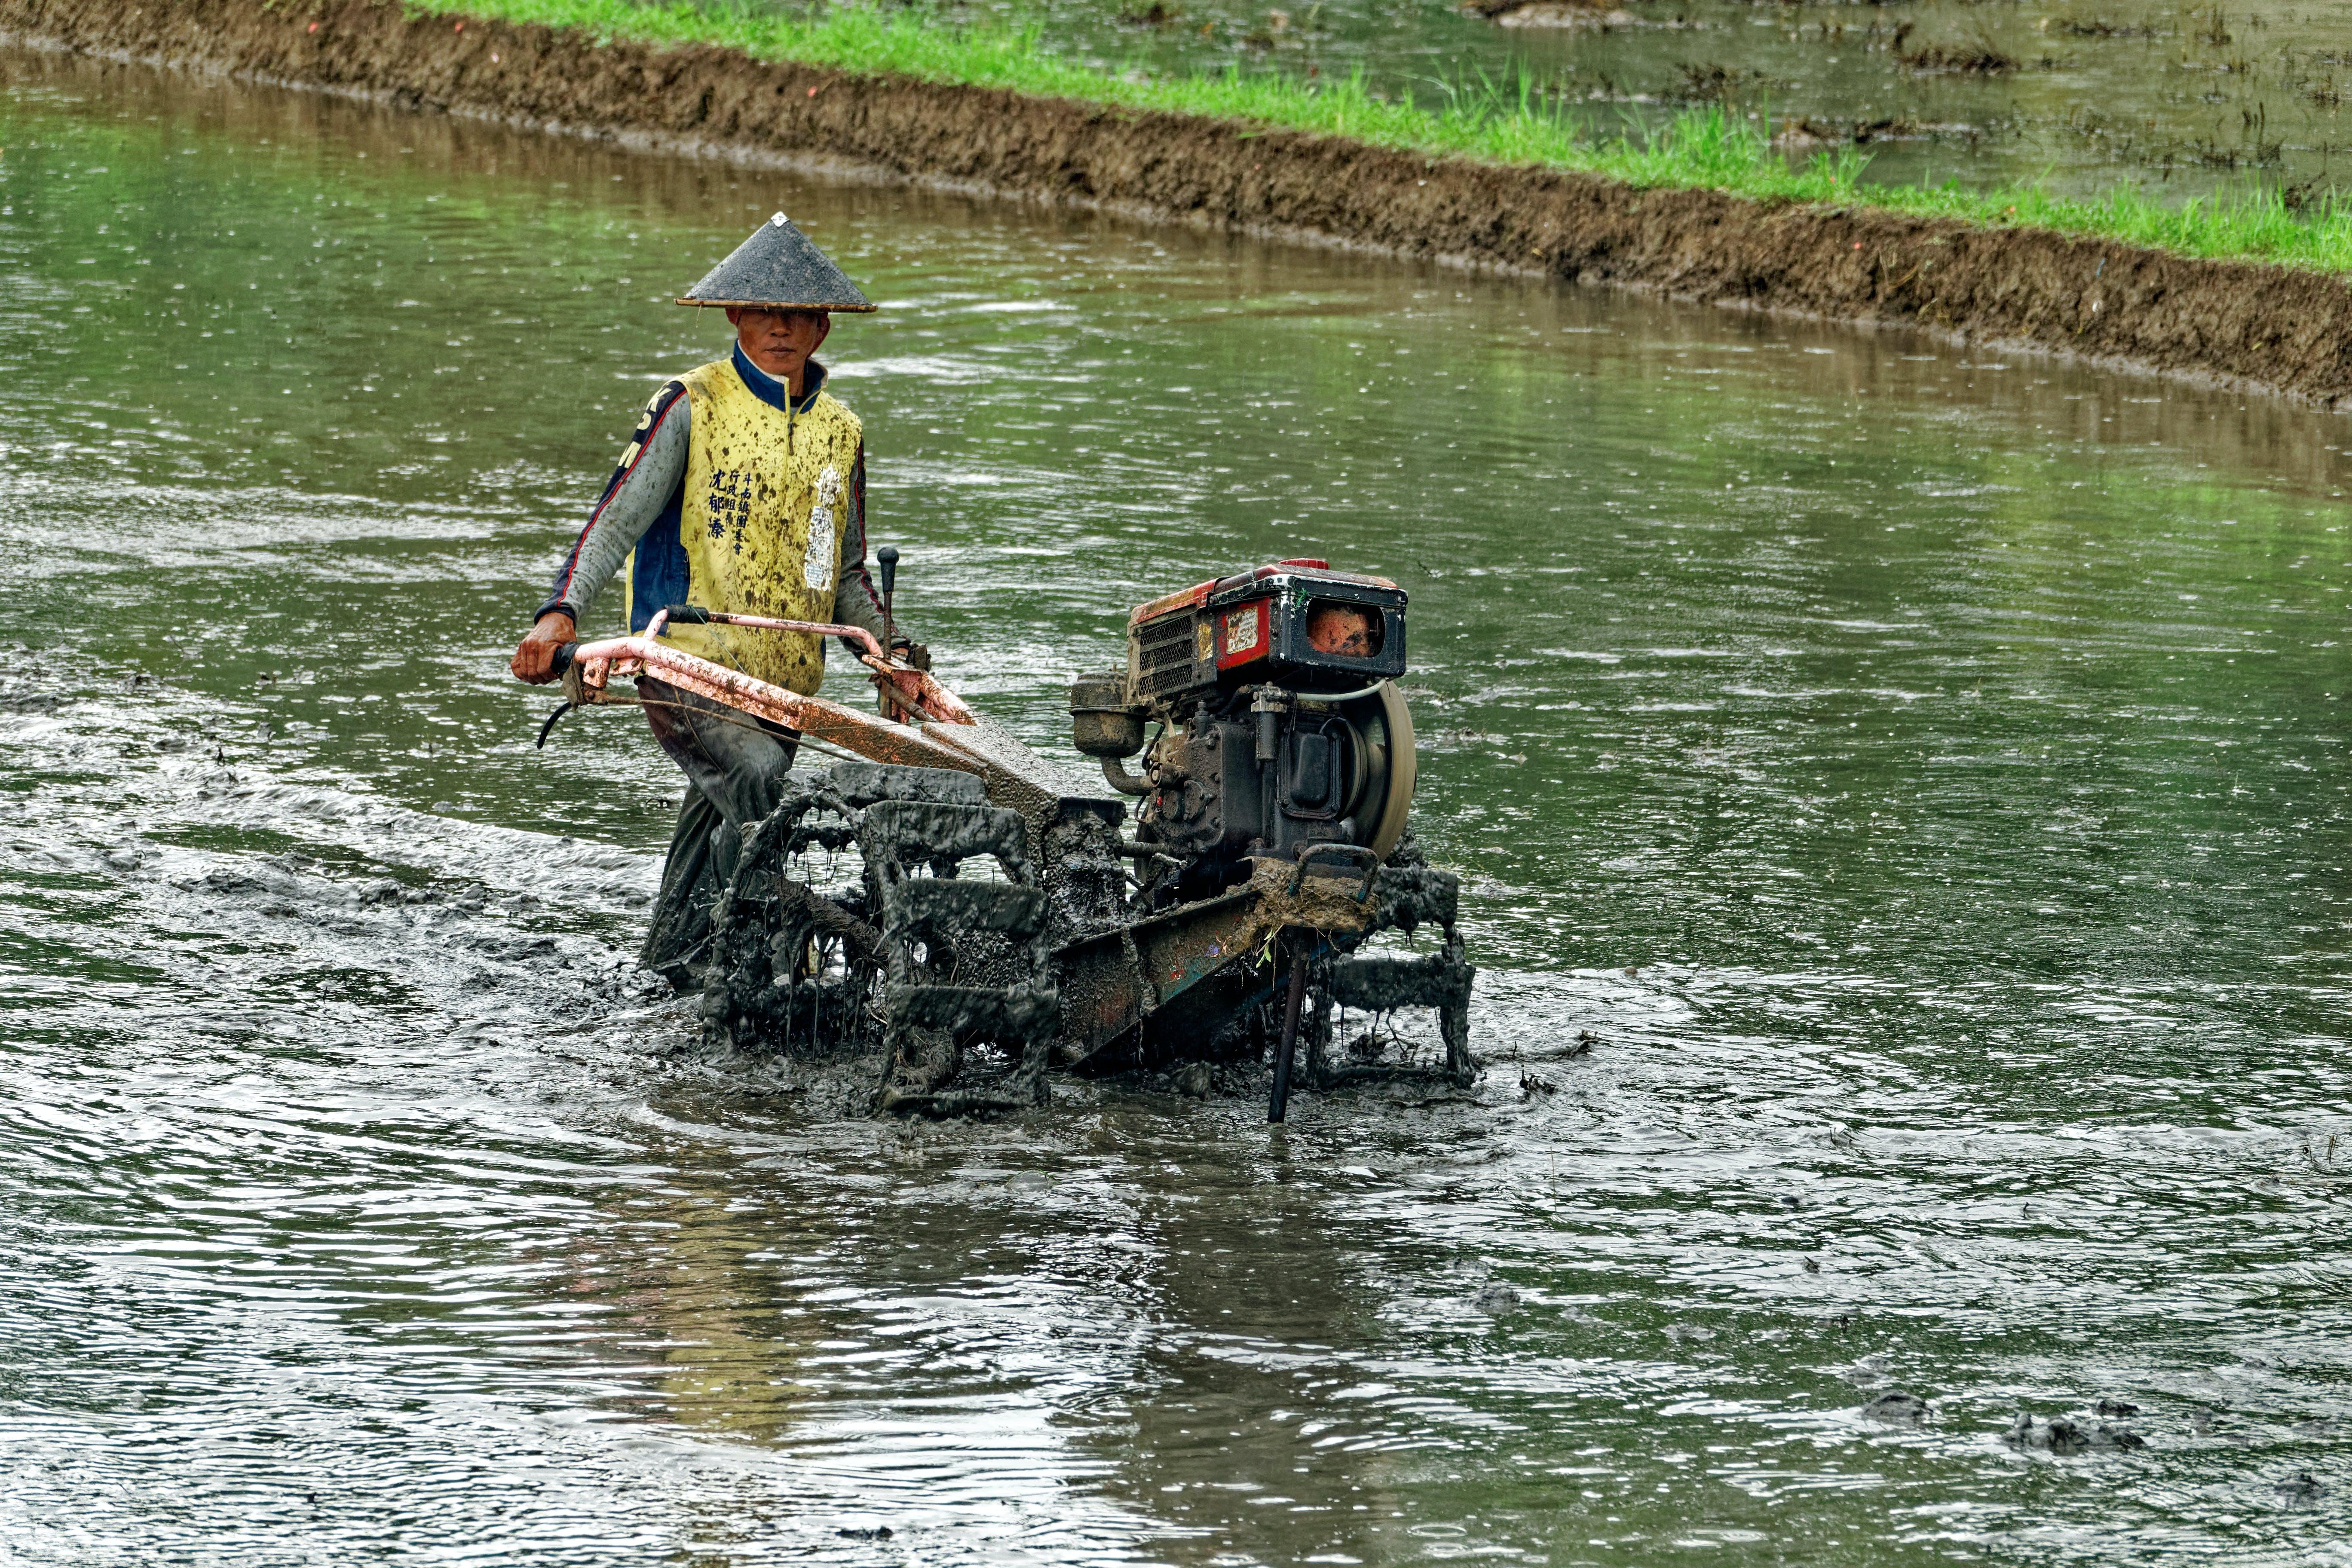 Man Pushing Wheeled Machine Into Body of Water